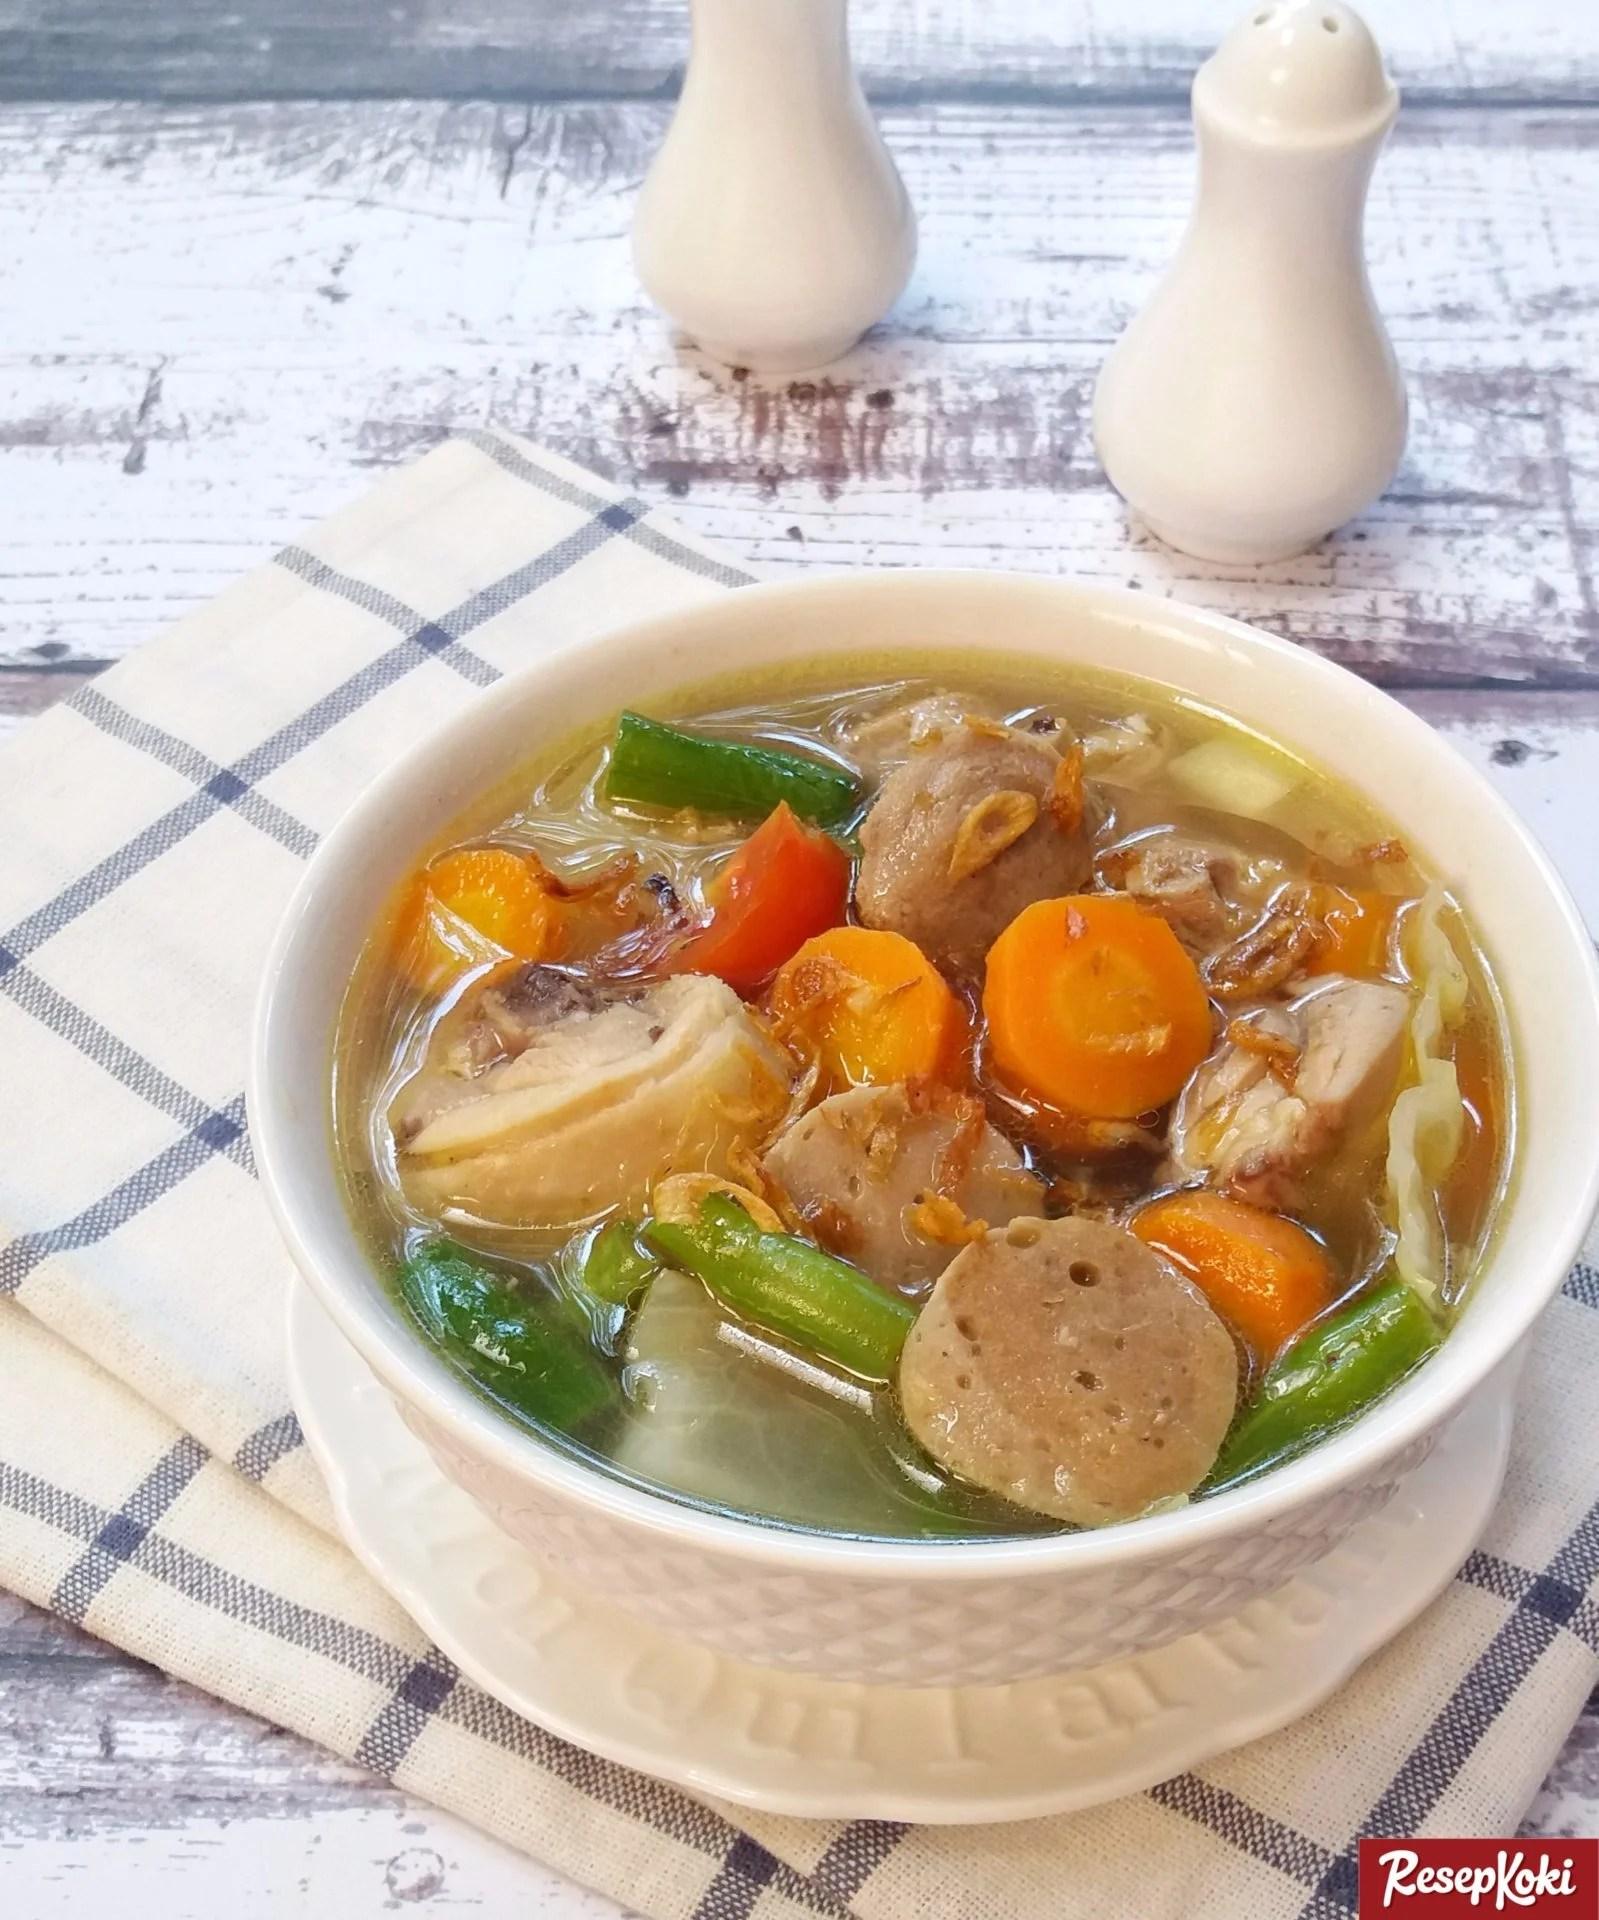 Resep Sayur Sop Yang Enak : resep, sayur, Bakso, Gurih, Segar, Istimewa, Praktis, Resep, ResepKoki